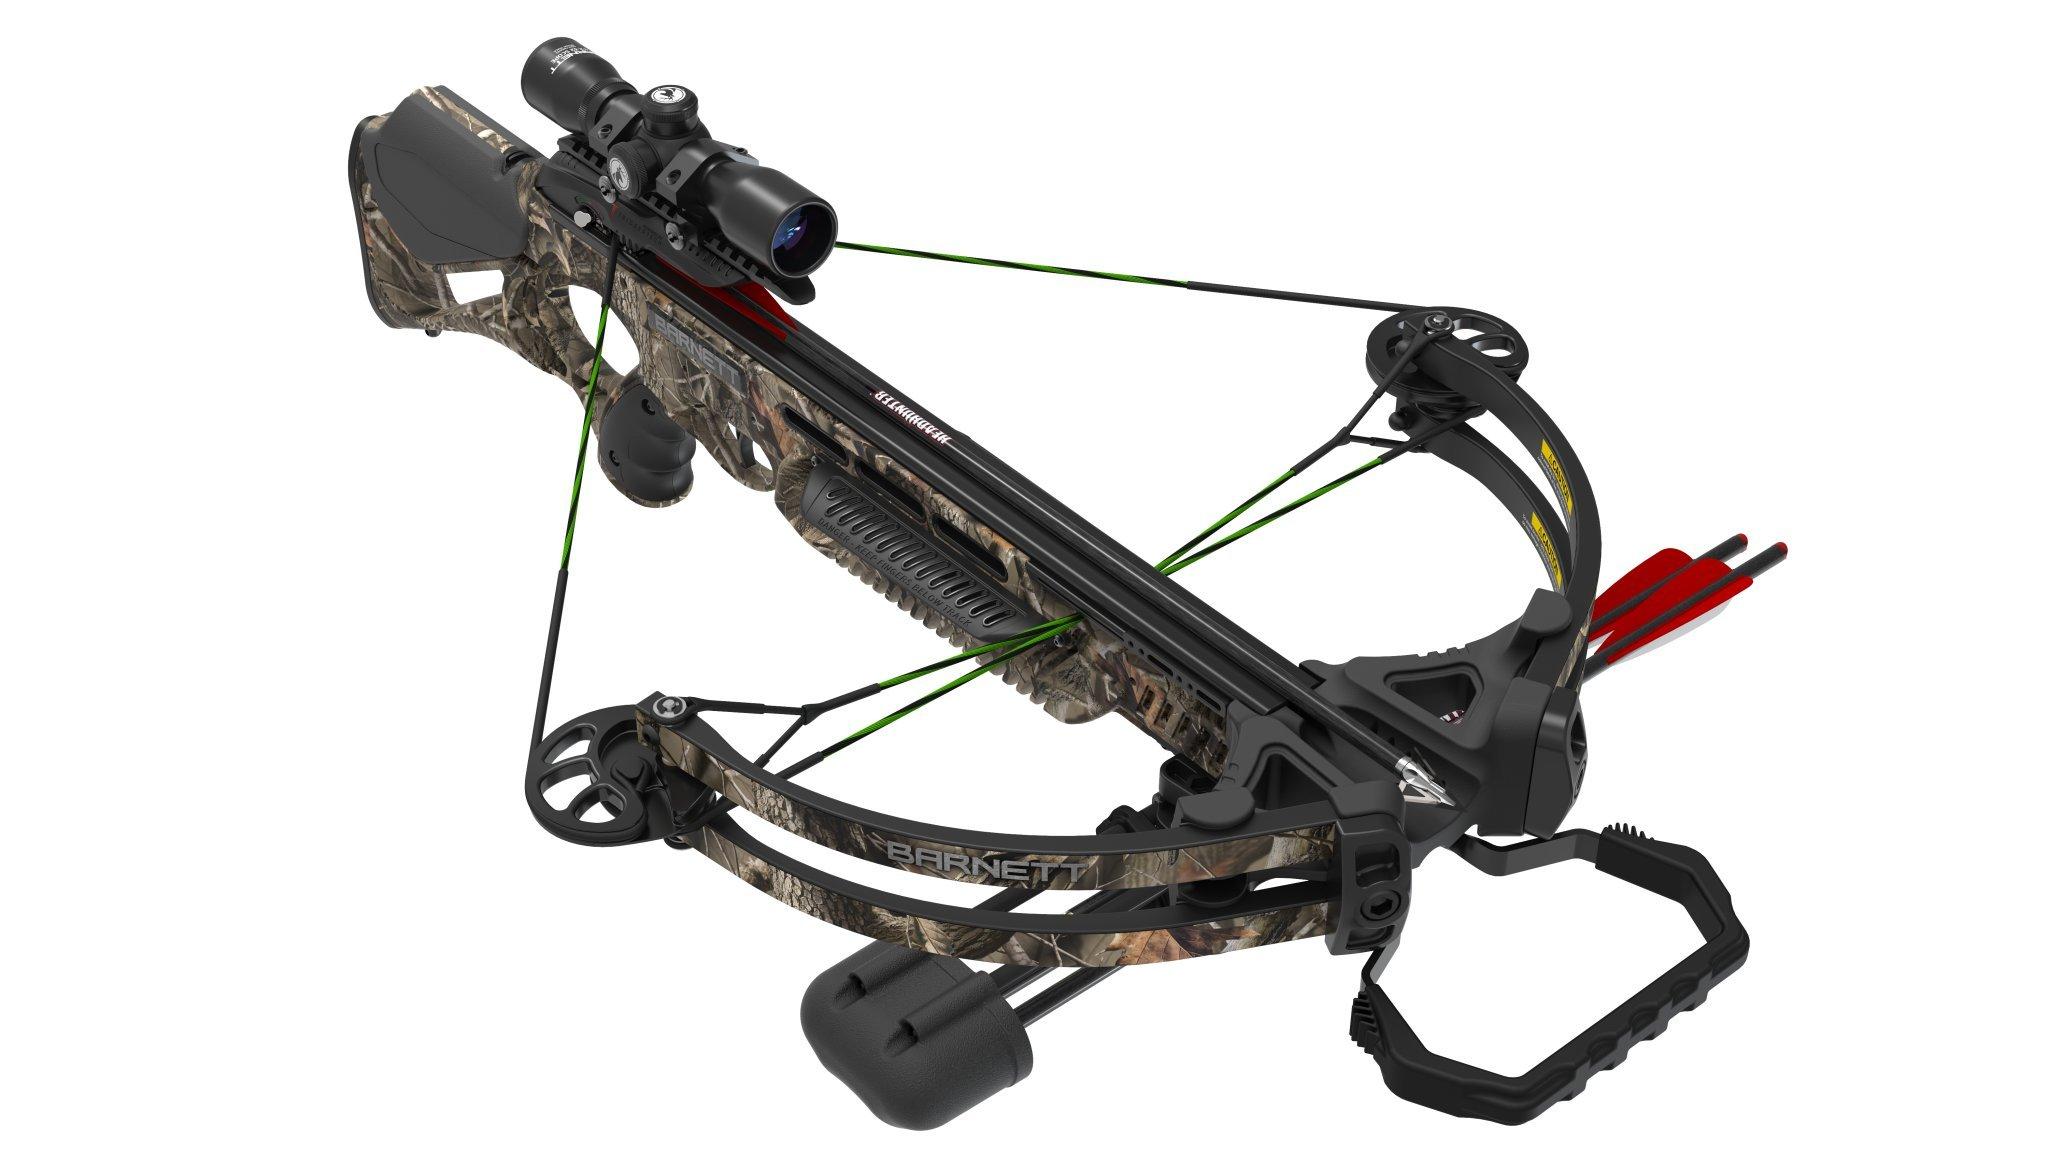 Barnett BC Droptine NXT Crossbow Package, 360 FPS, Realtree Hardwoods Camo